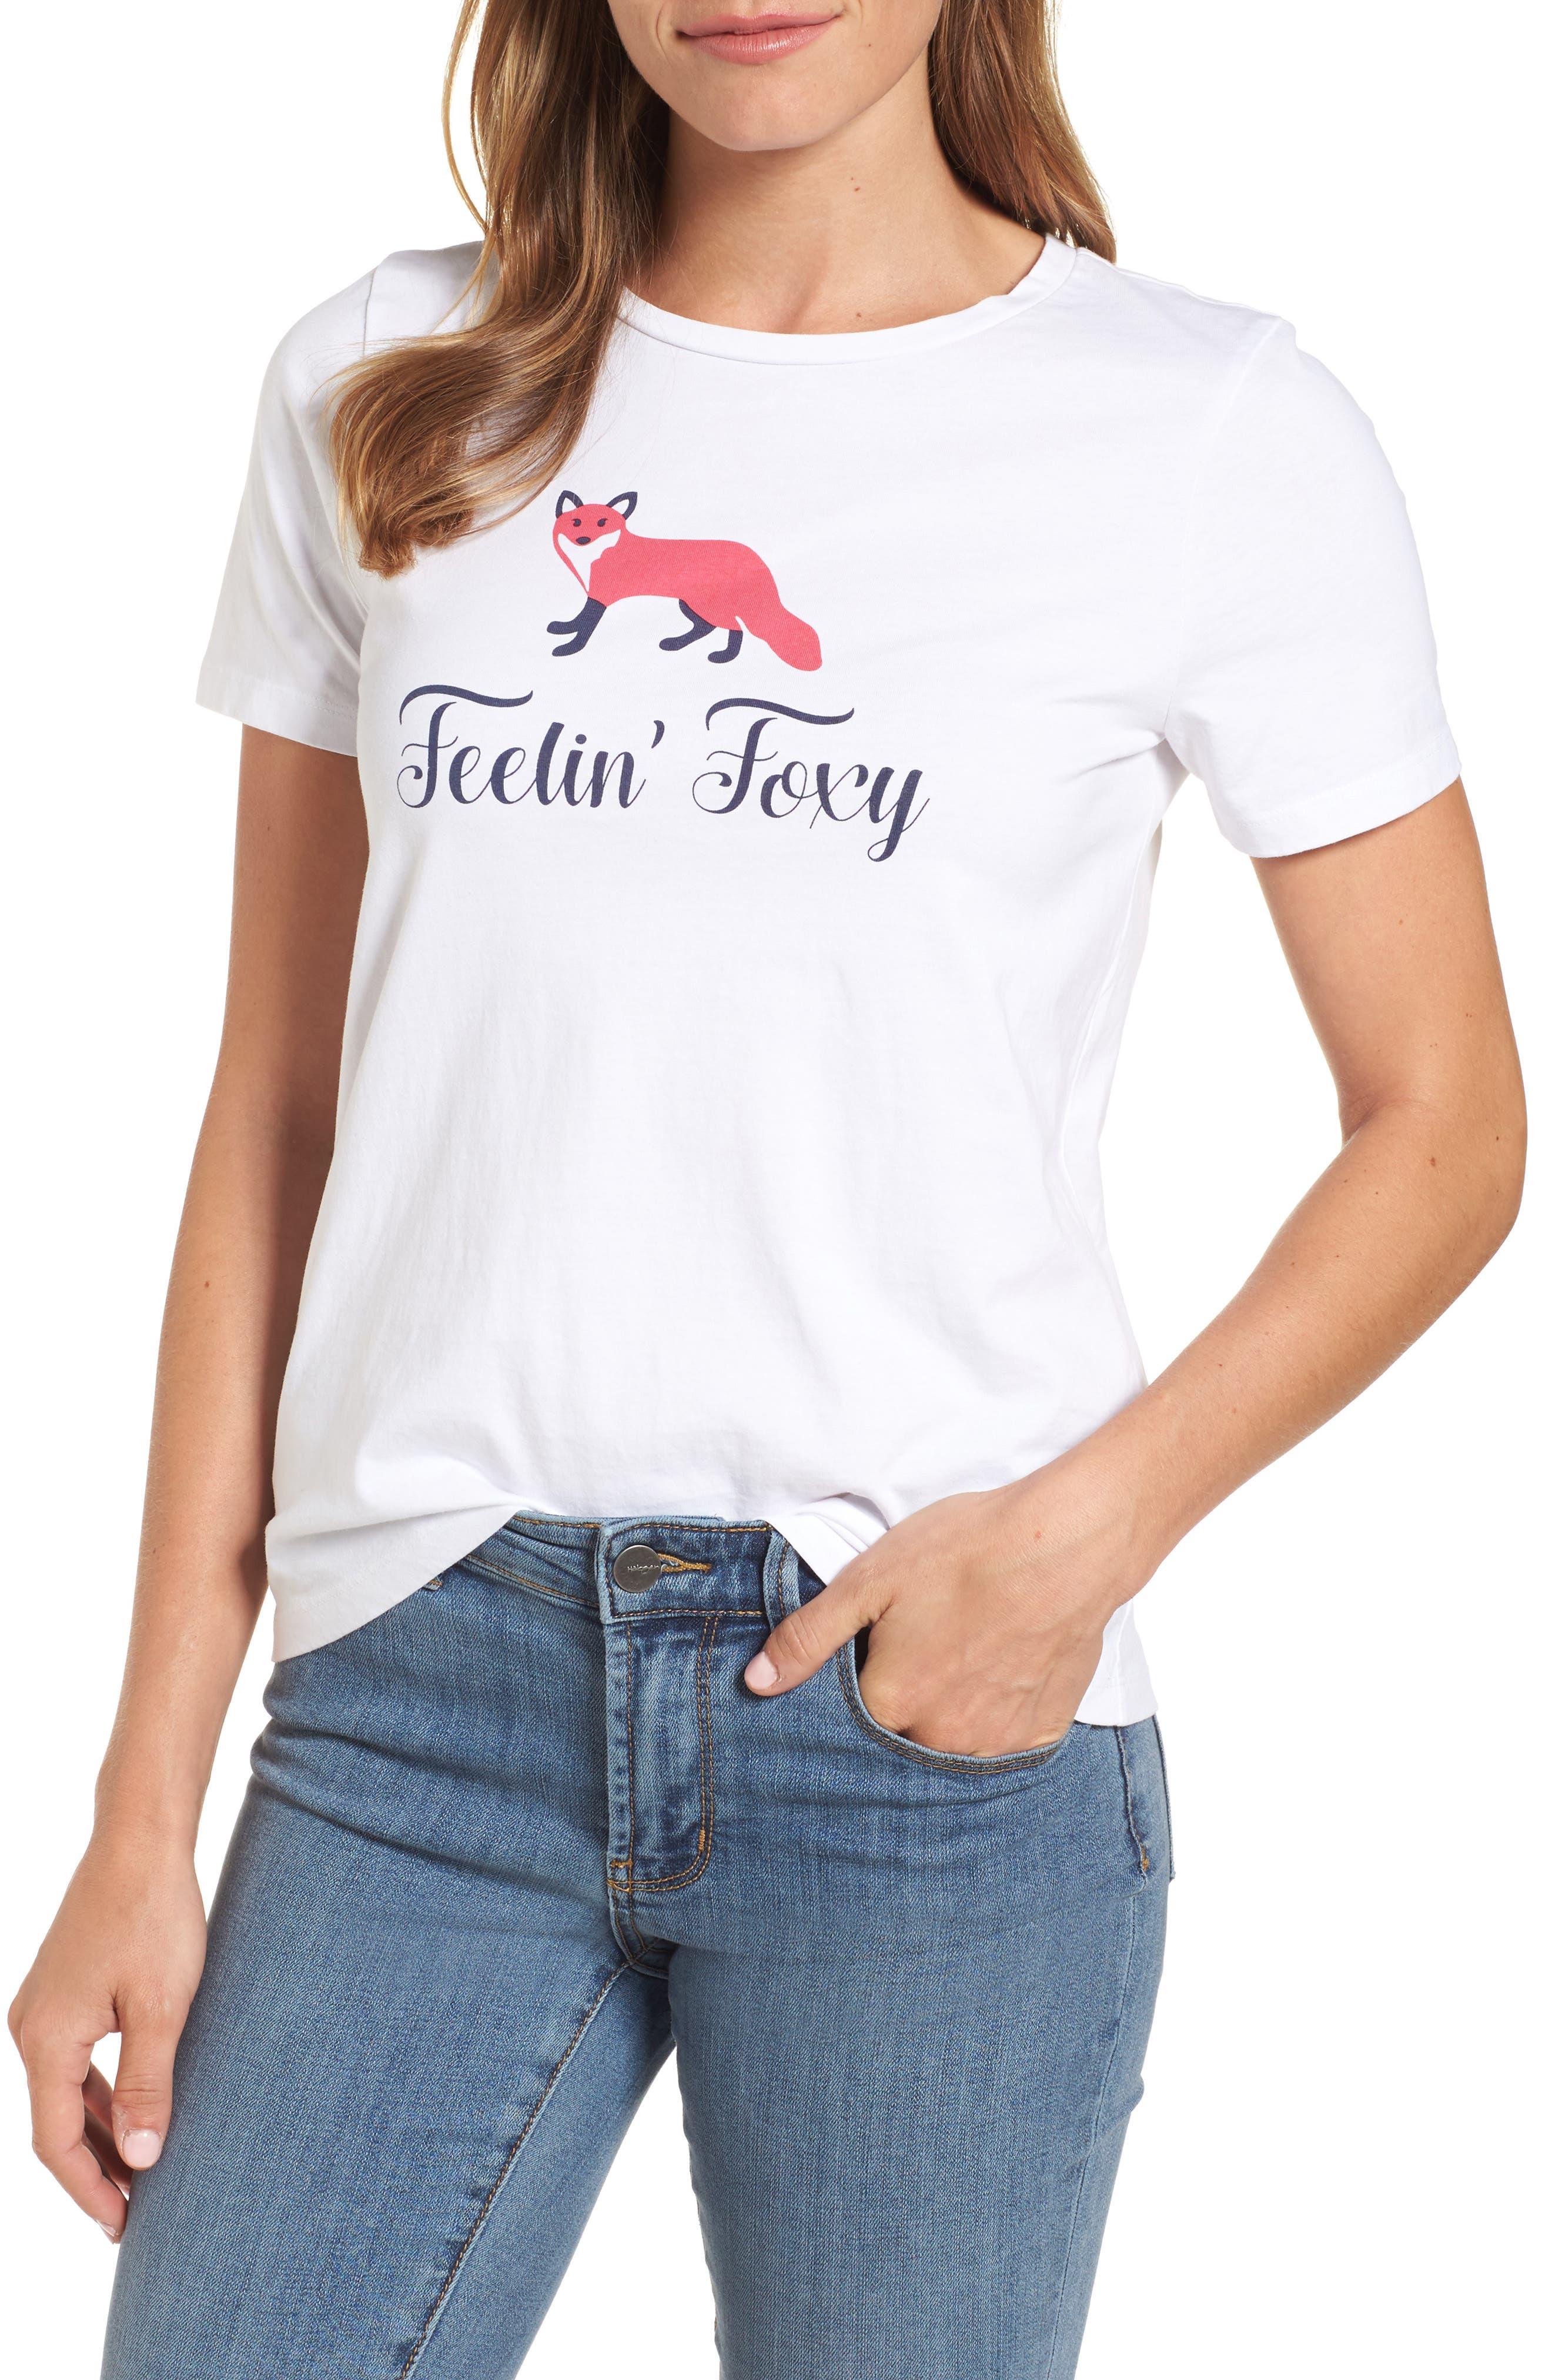 Feelin' Foxy Tee,                         Main,                         color, Willow White